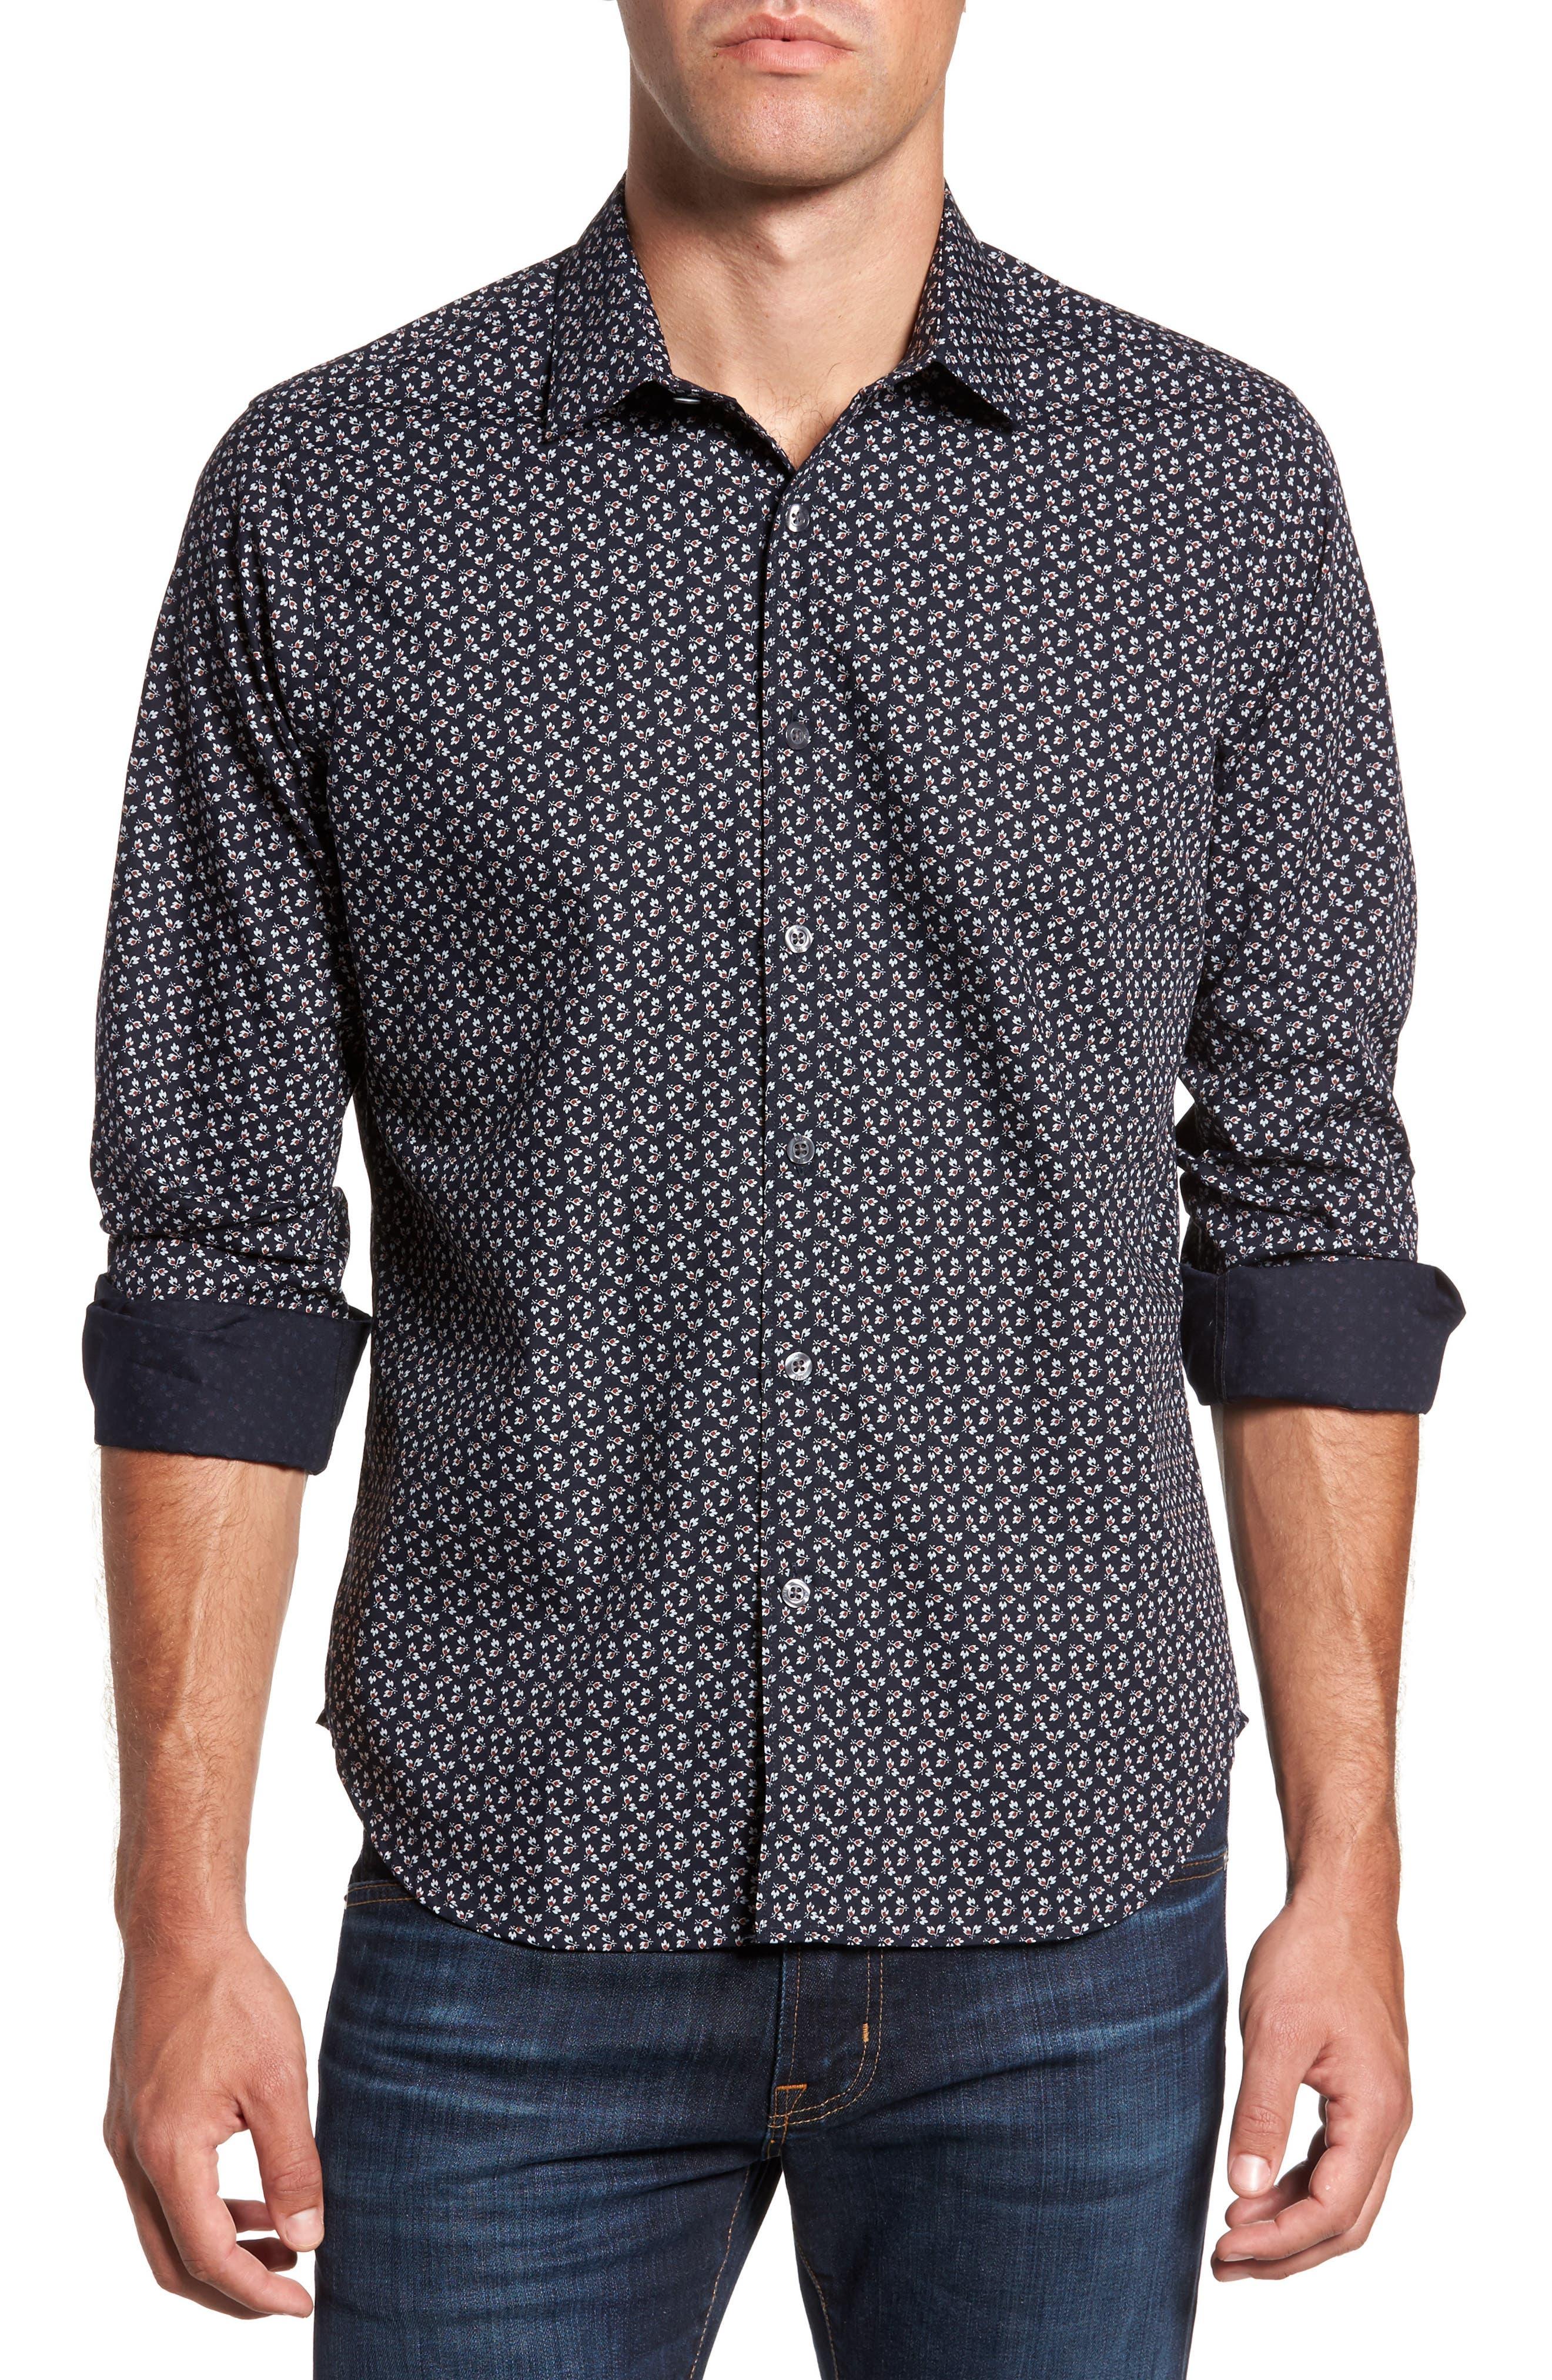 Alternate Image 1 Selected - Jeff Slim Fit Floral Print Sport Shirt